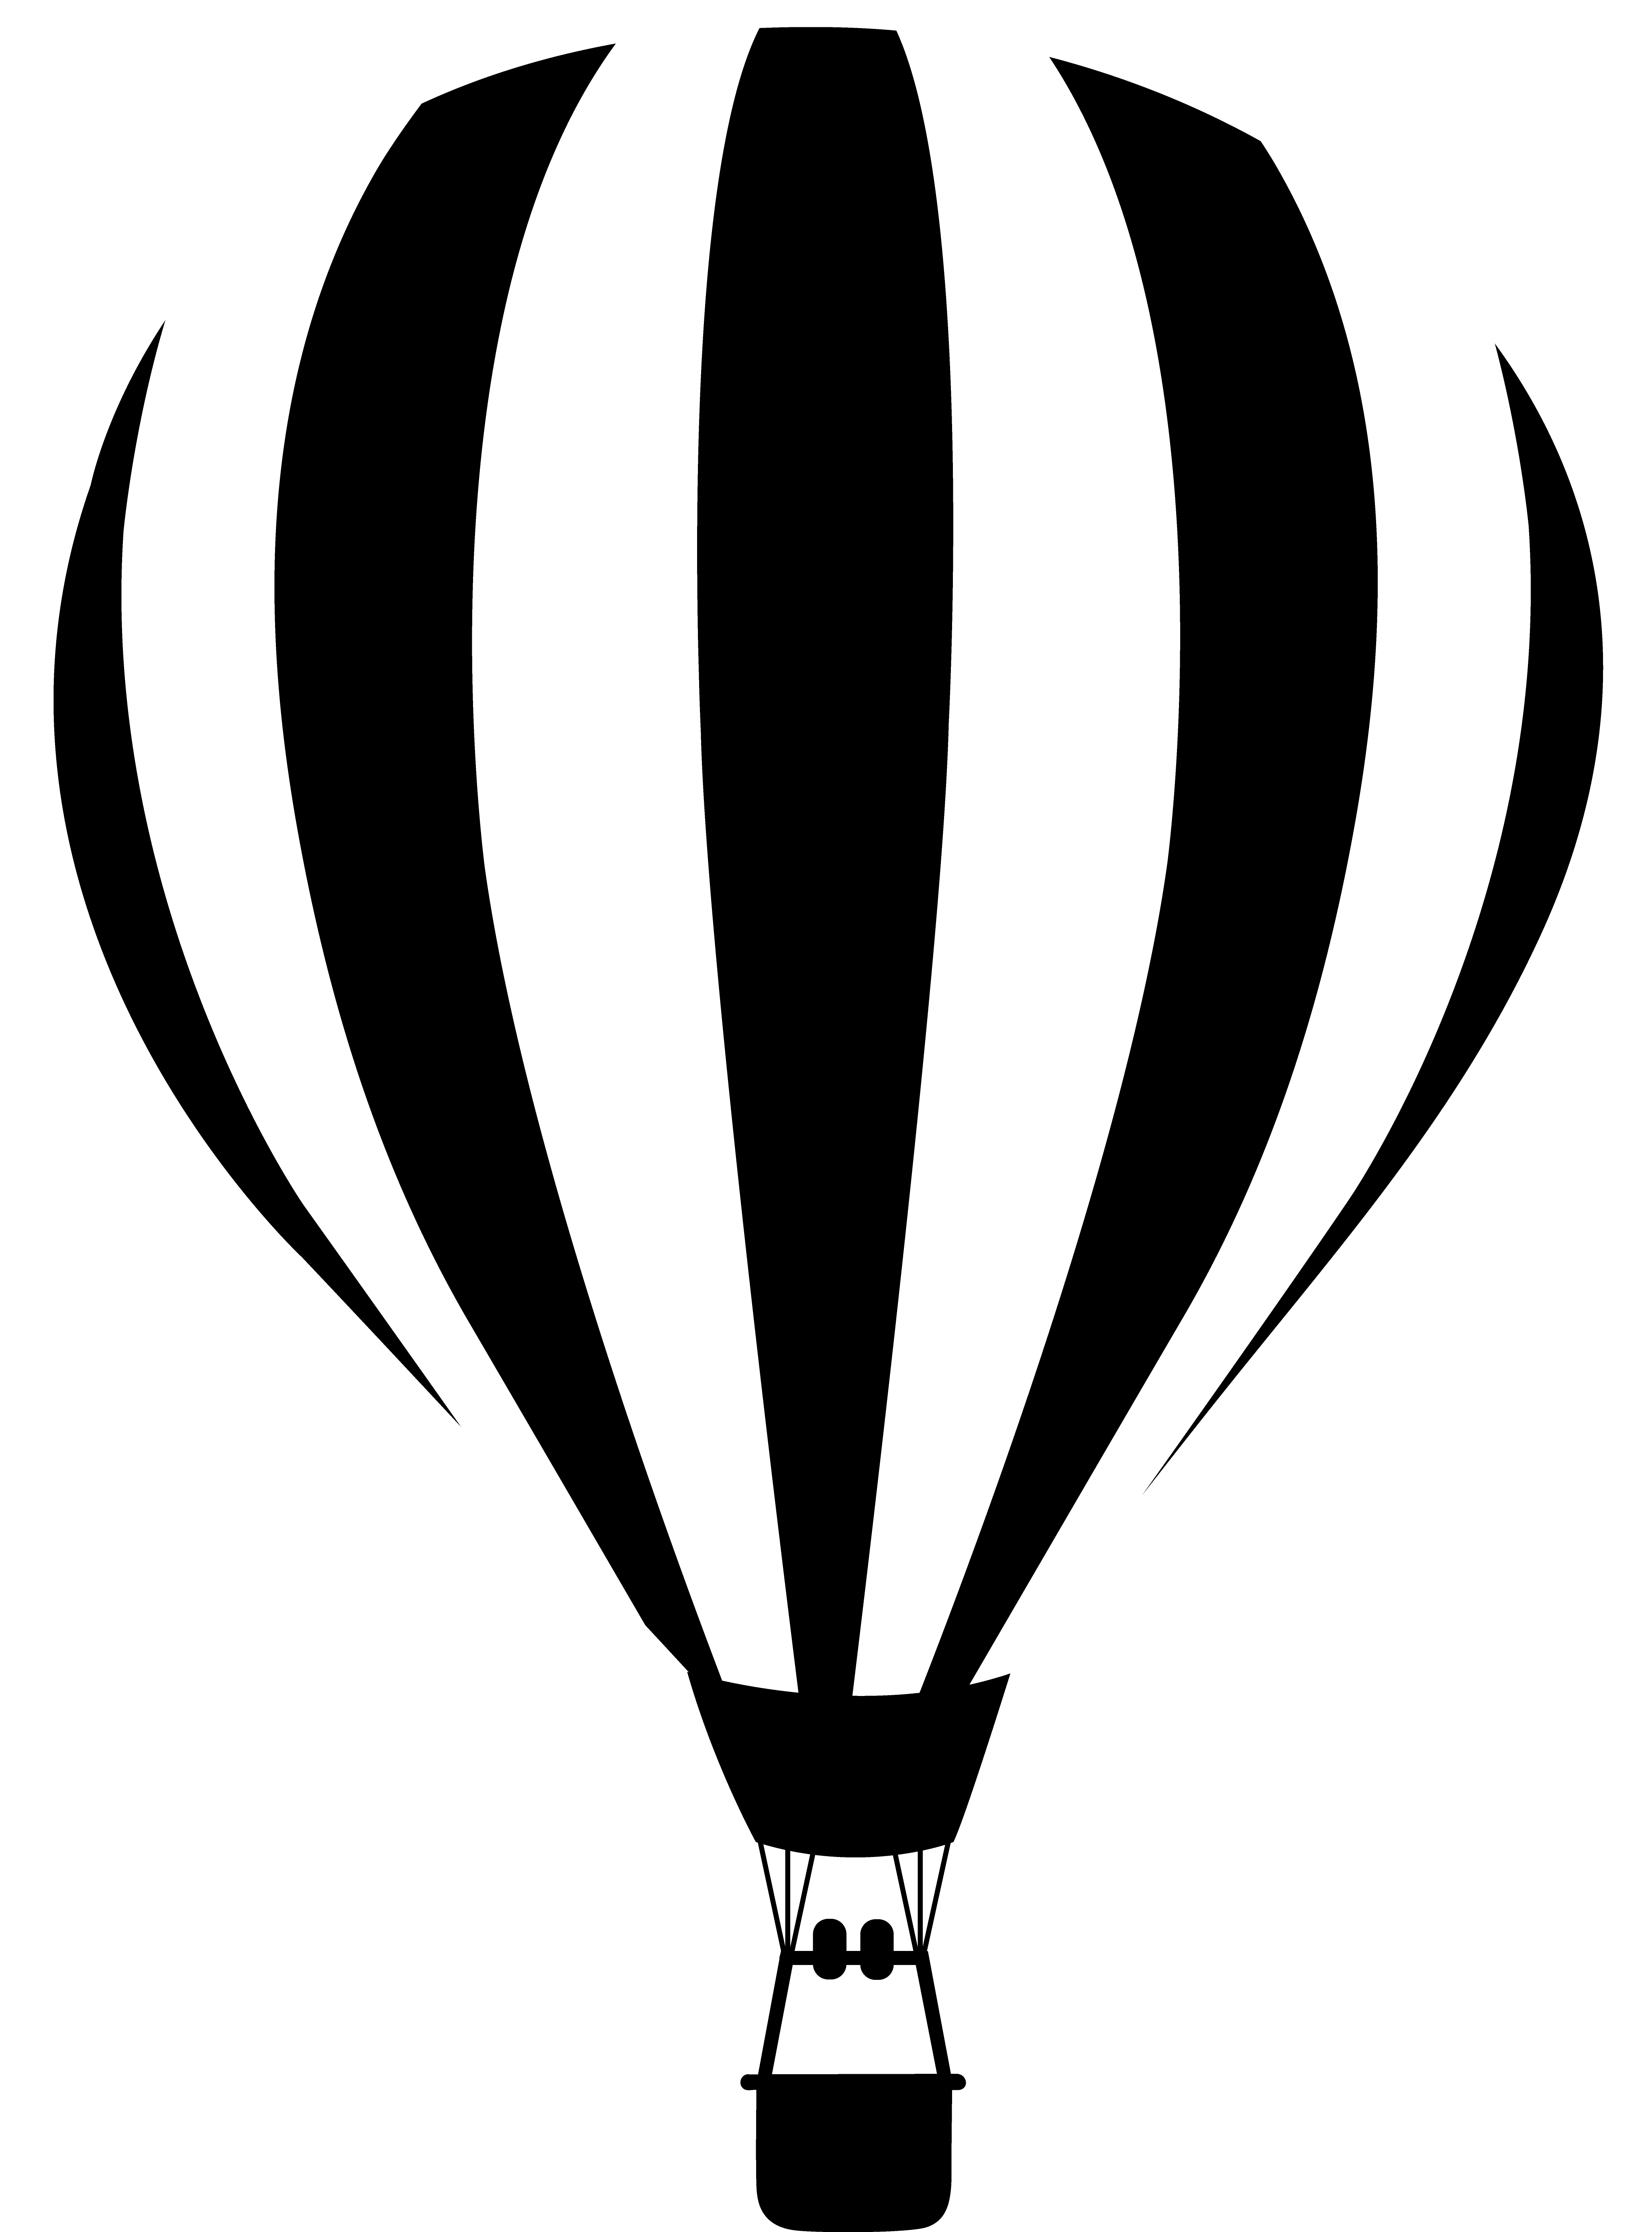 Vintage Hot Air Balloon Wallpaper | Clipart Panda - Free ...